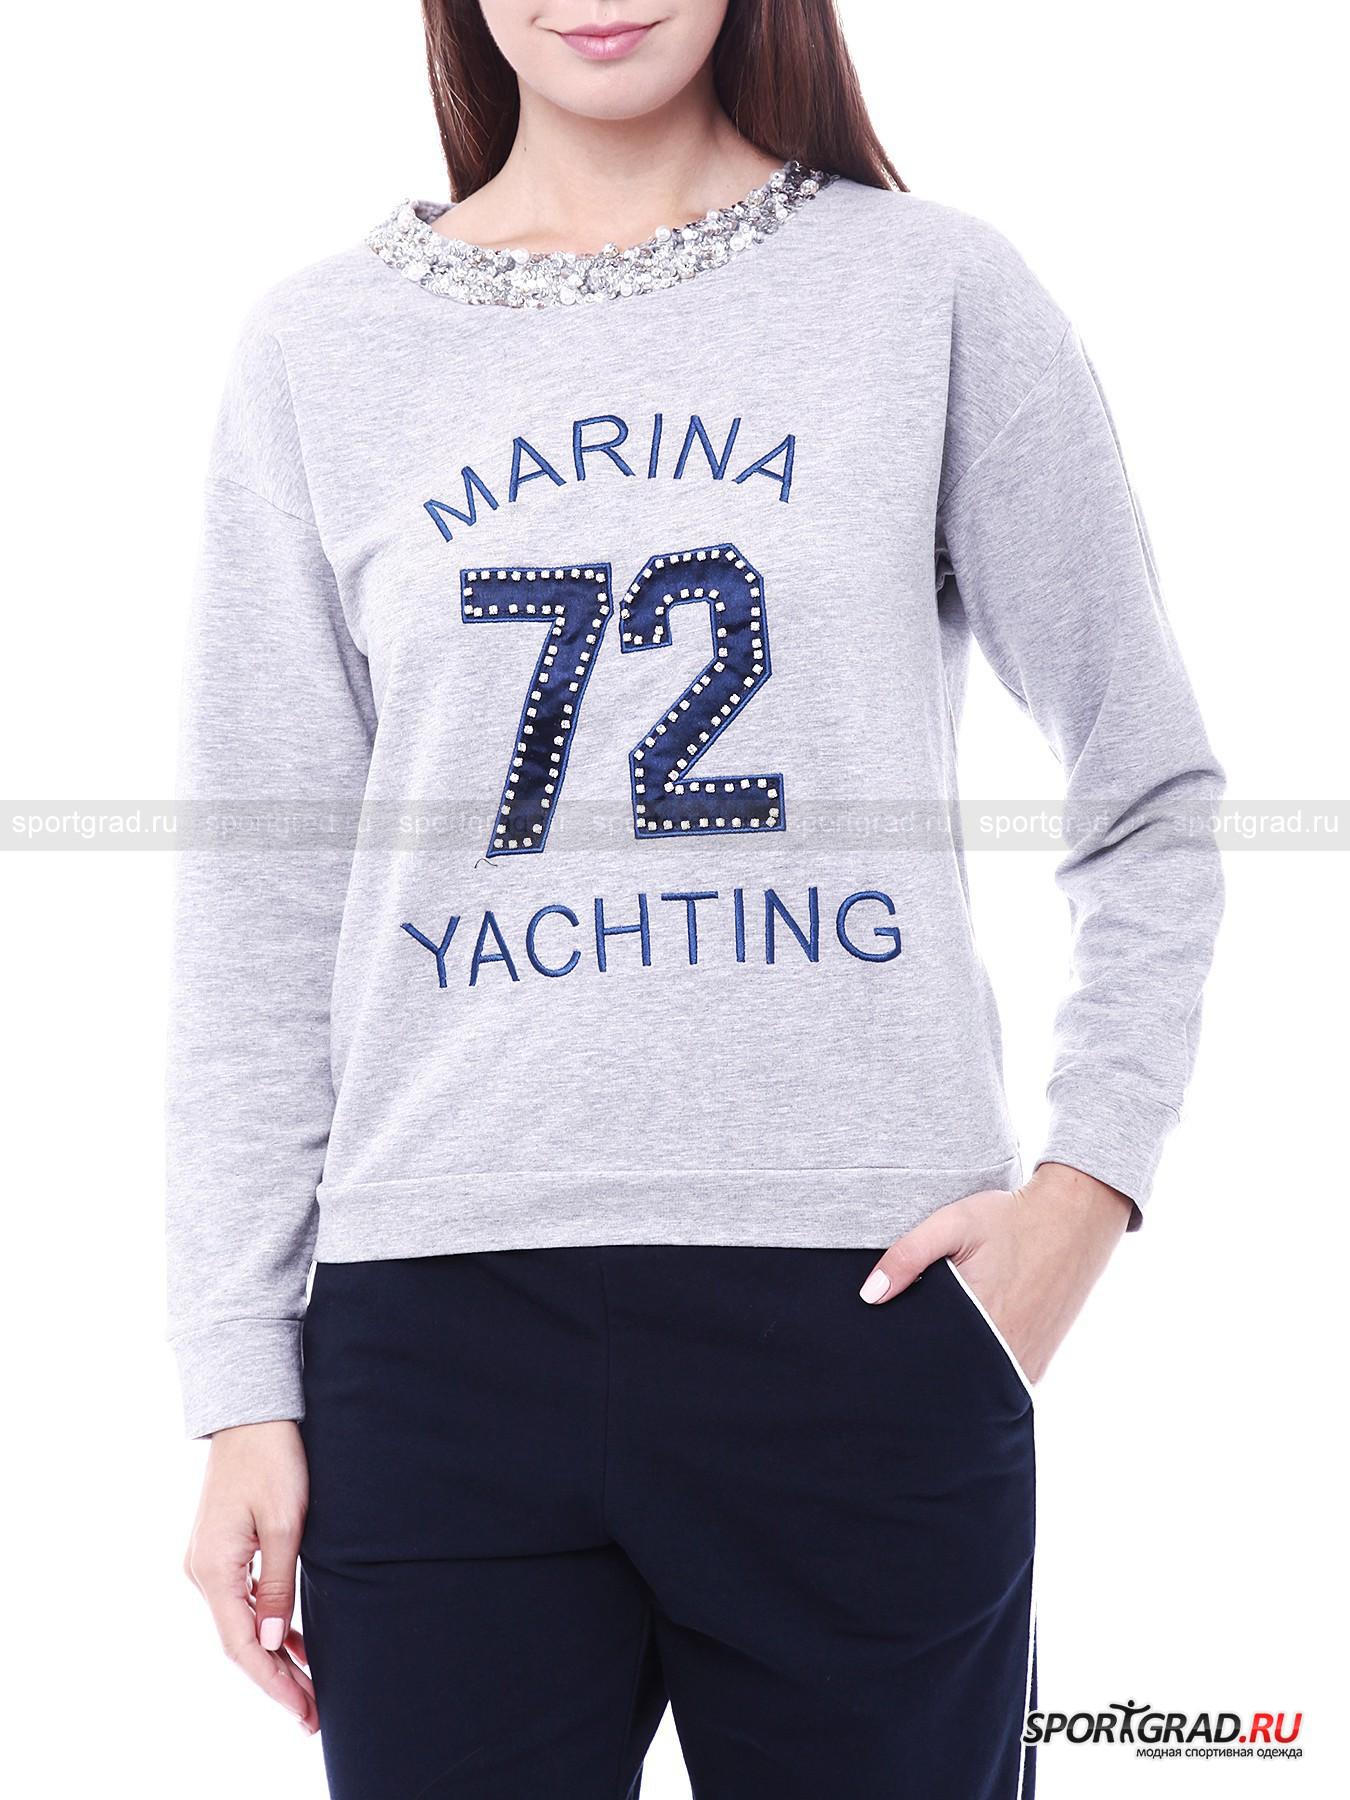 ��������� ������� MARINA YACHTING